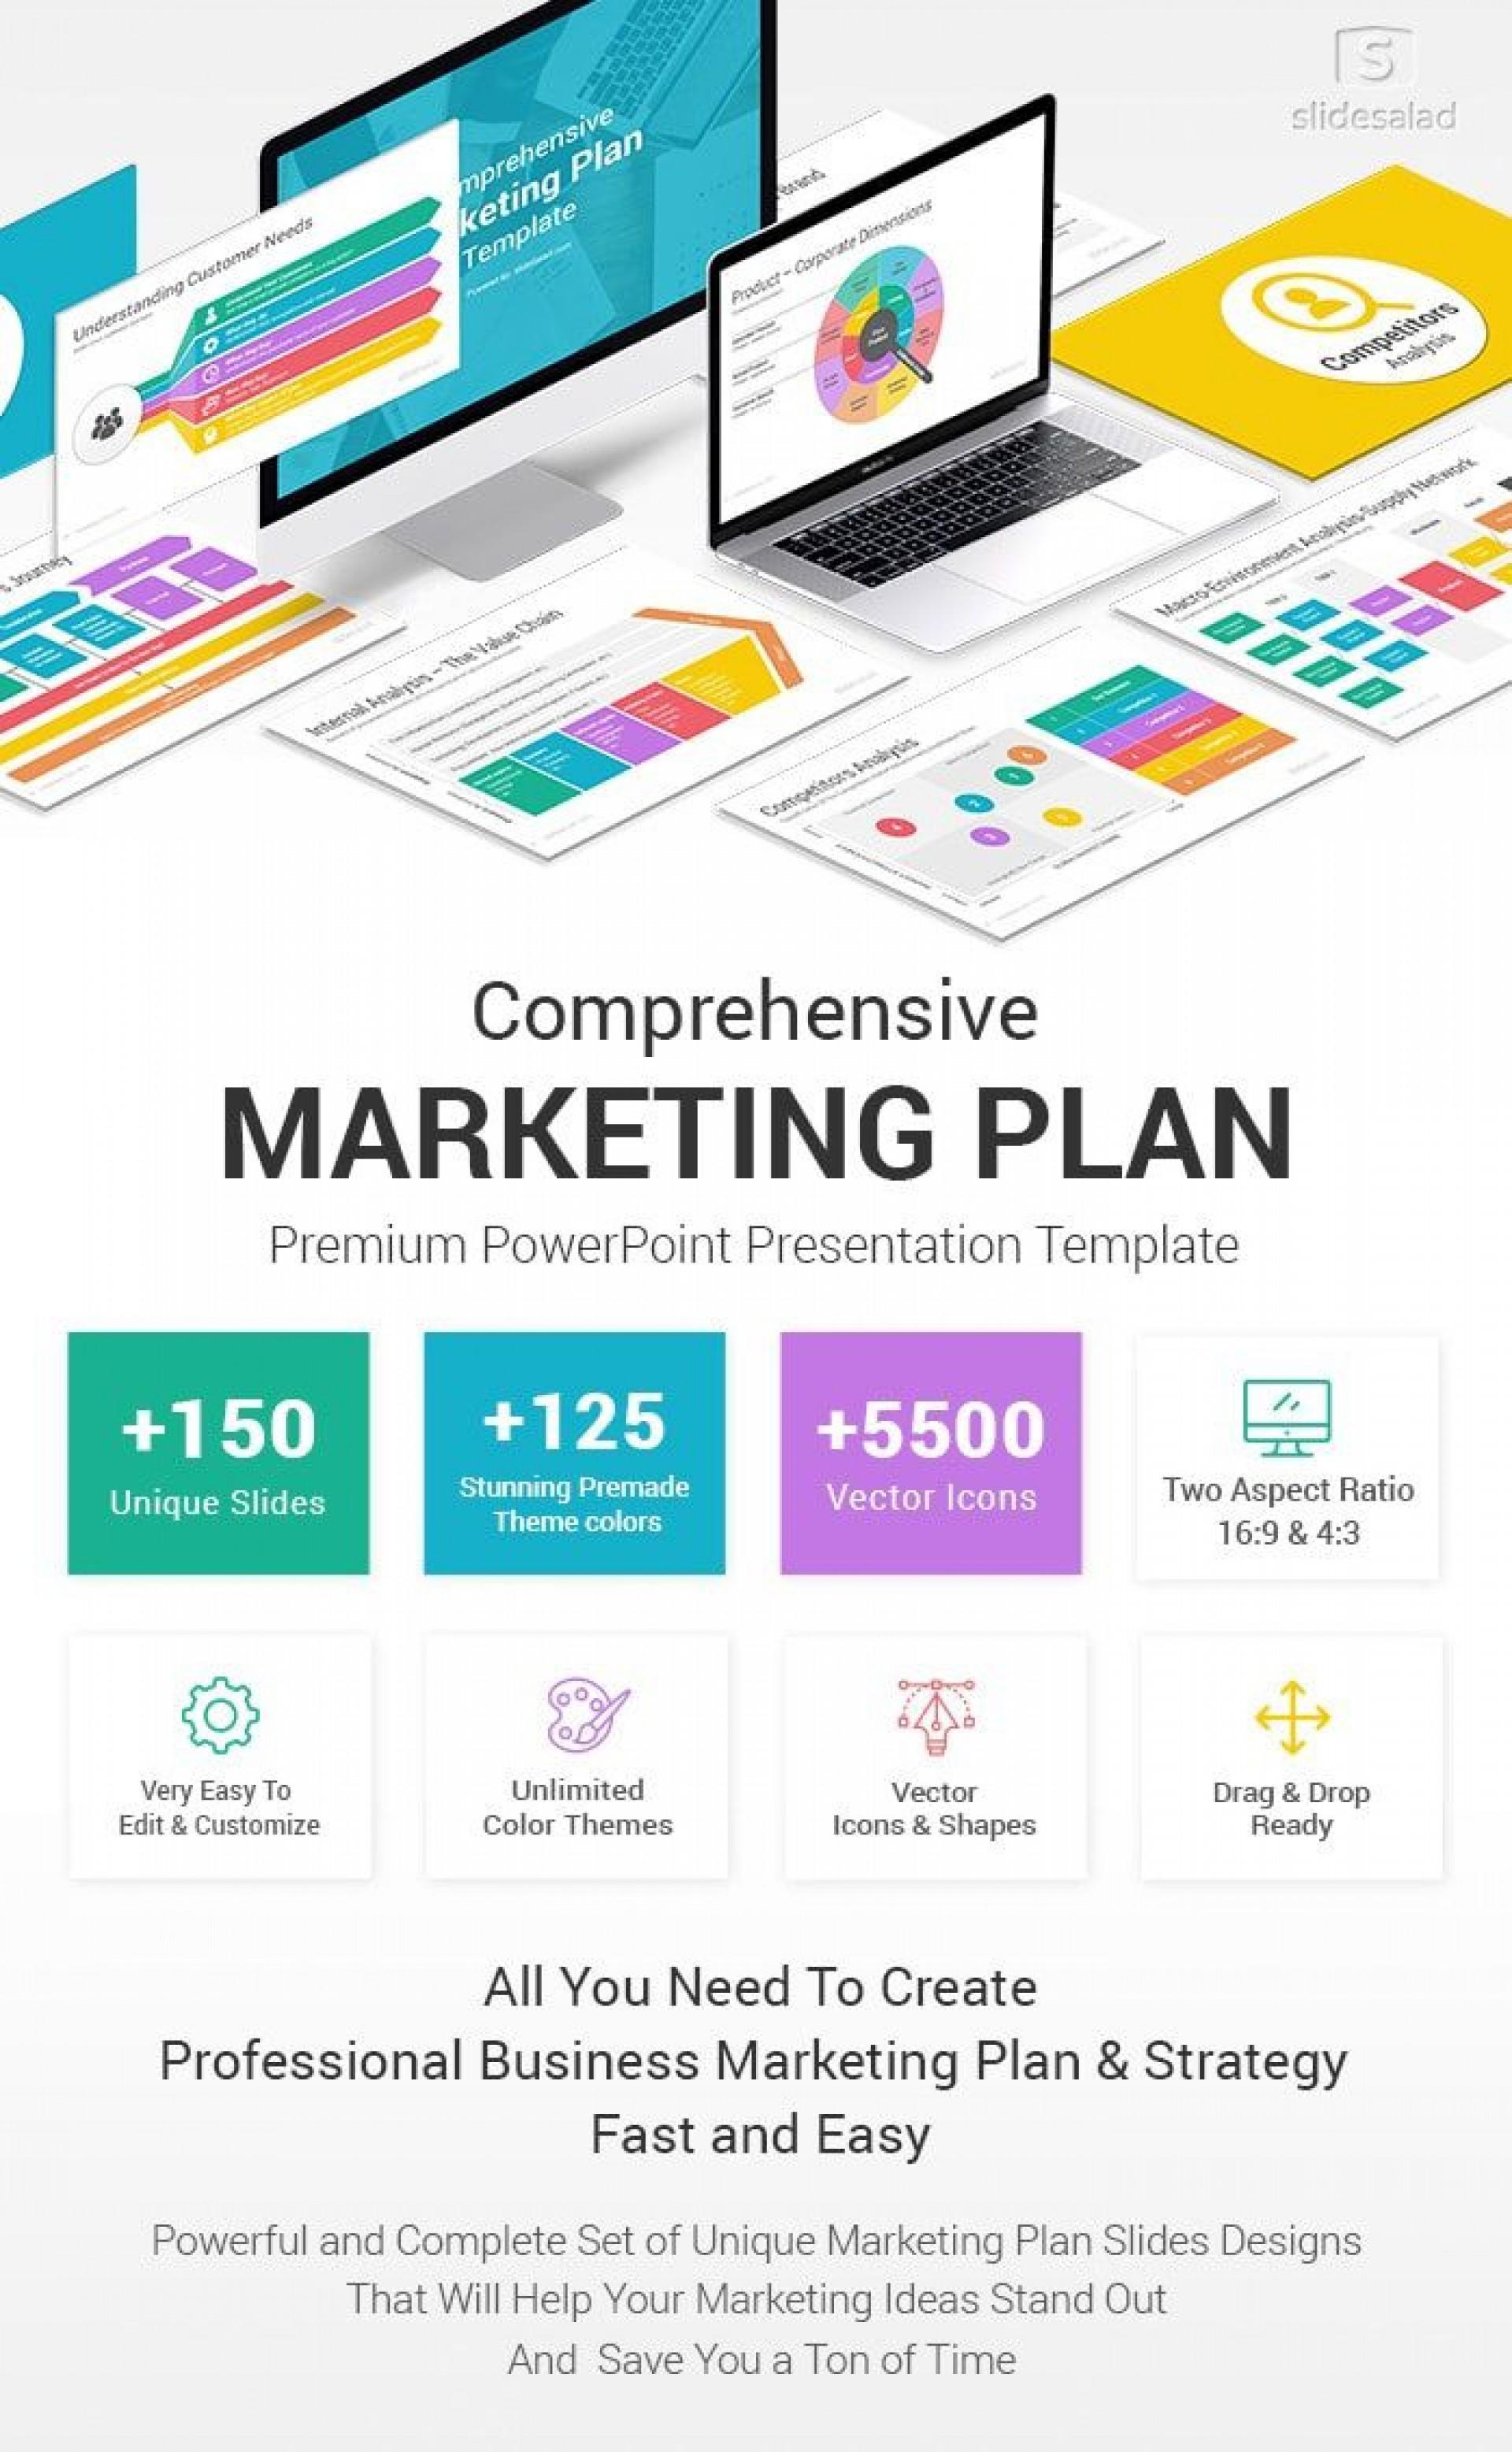 006 Imposing Digital Marketing Plan Template Ppt Inspiration  Presentation Free Slideshare1920